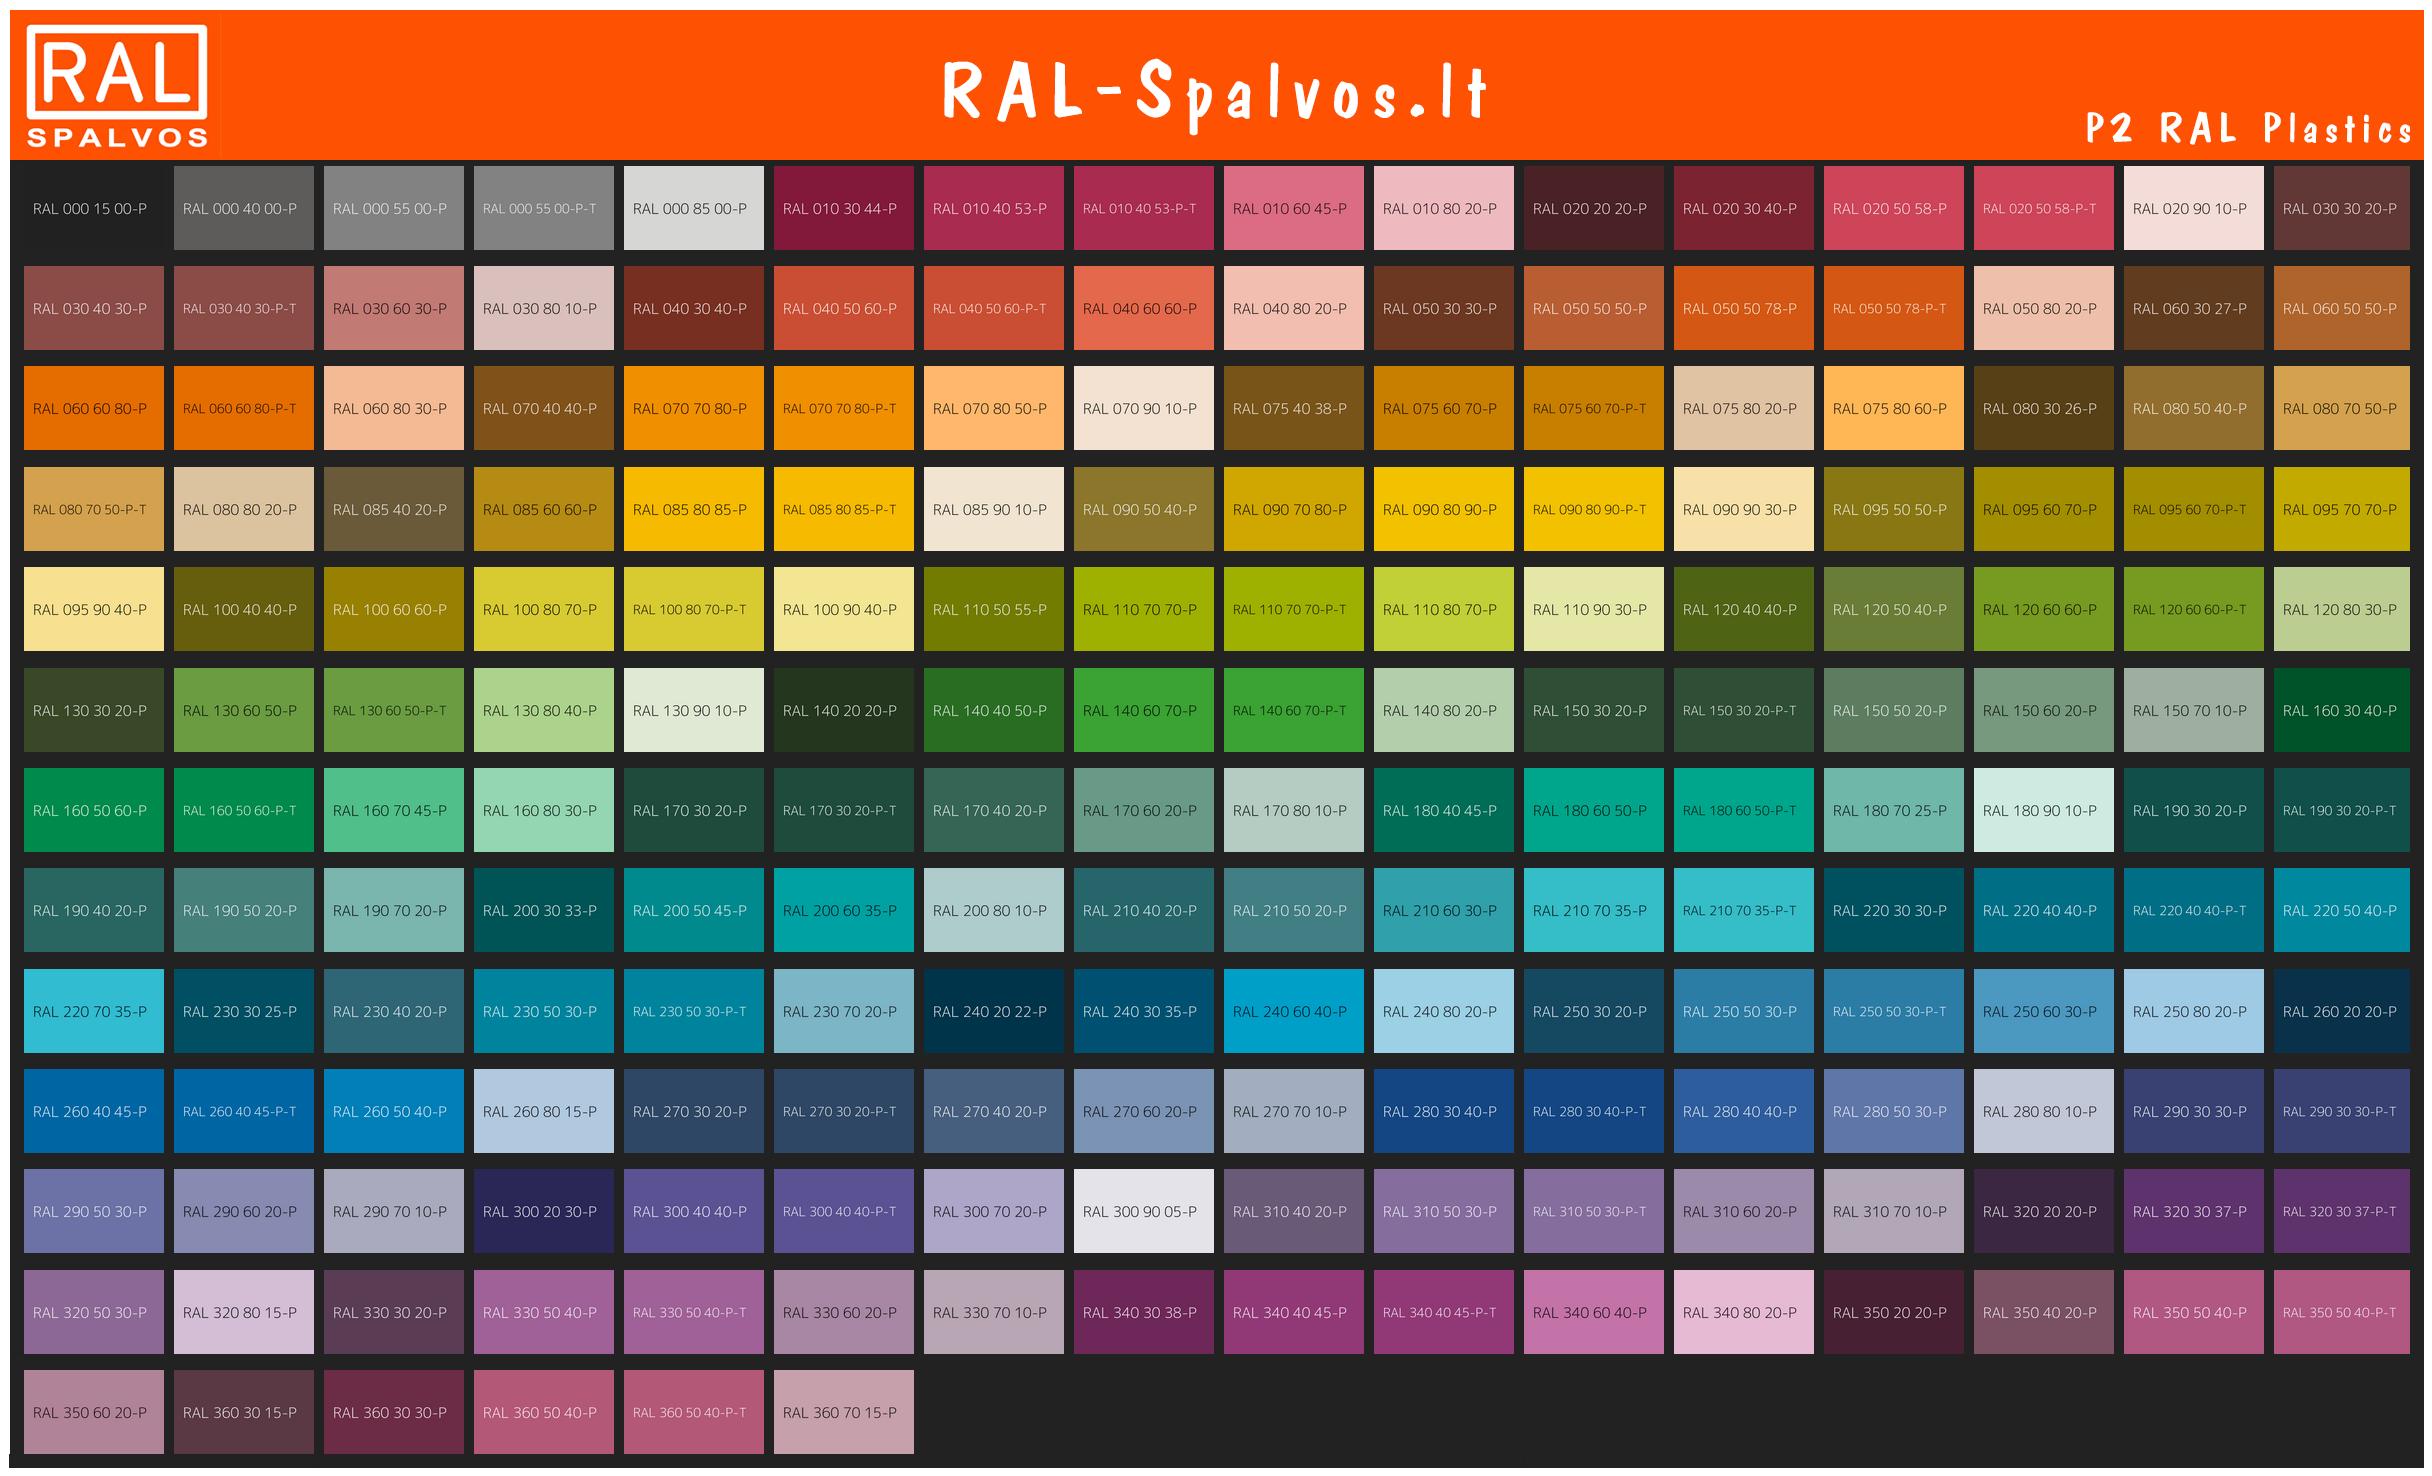 RAL Plastics P2 spalvų katalogas